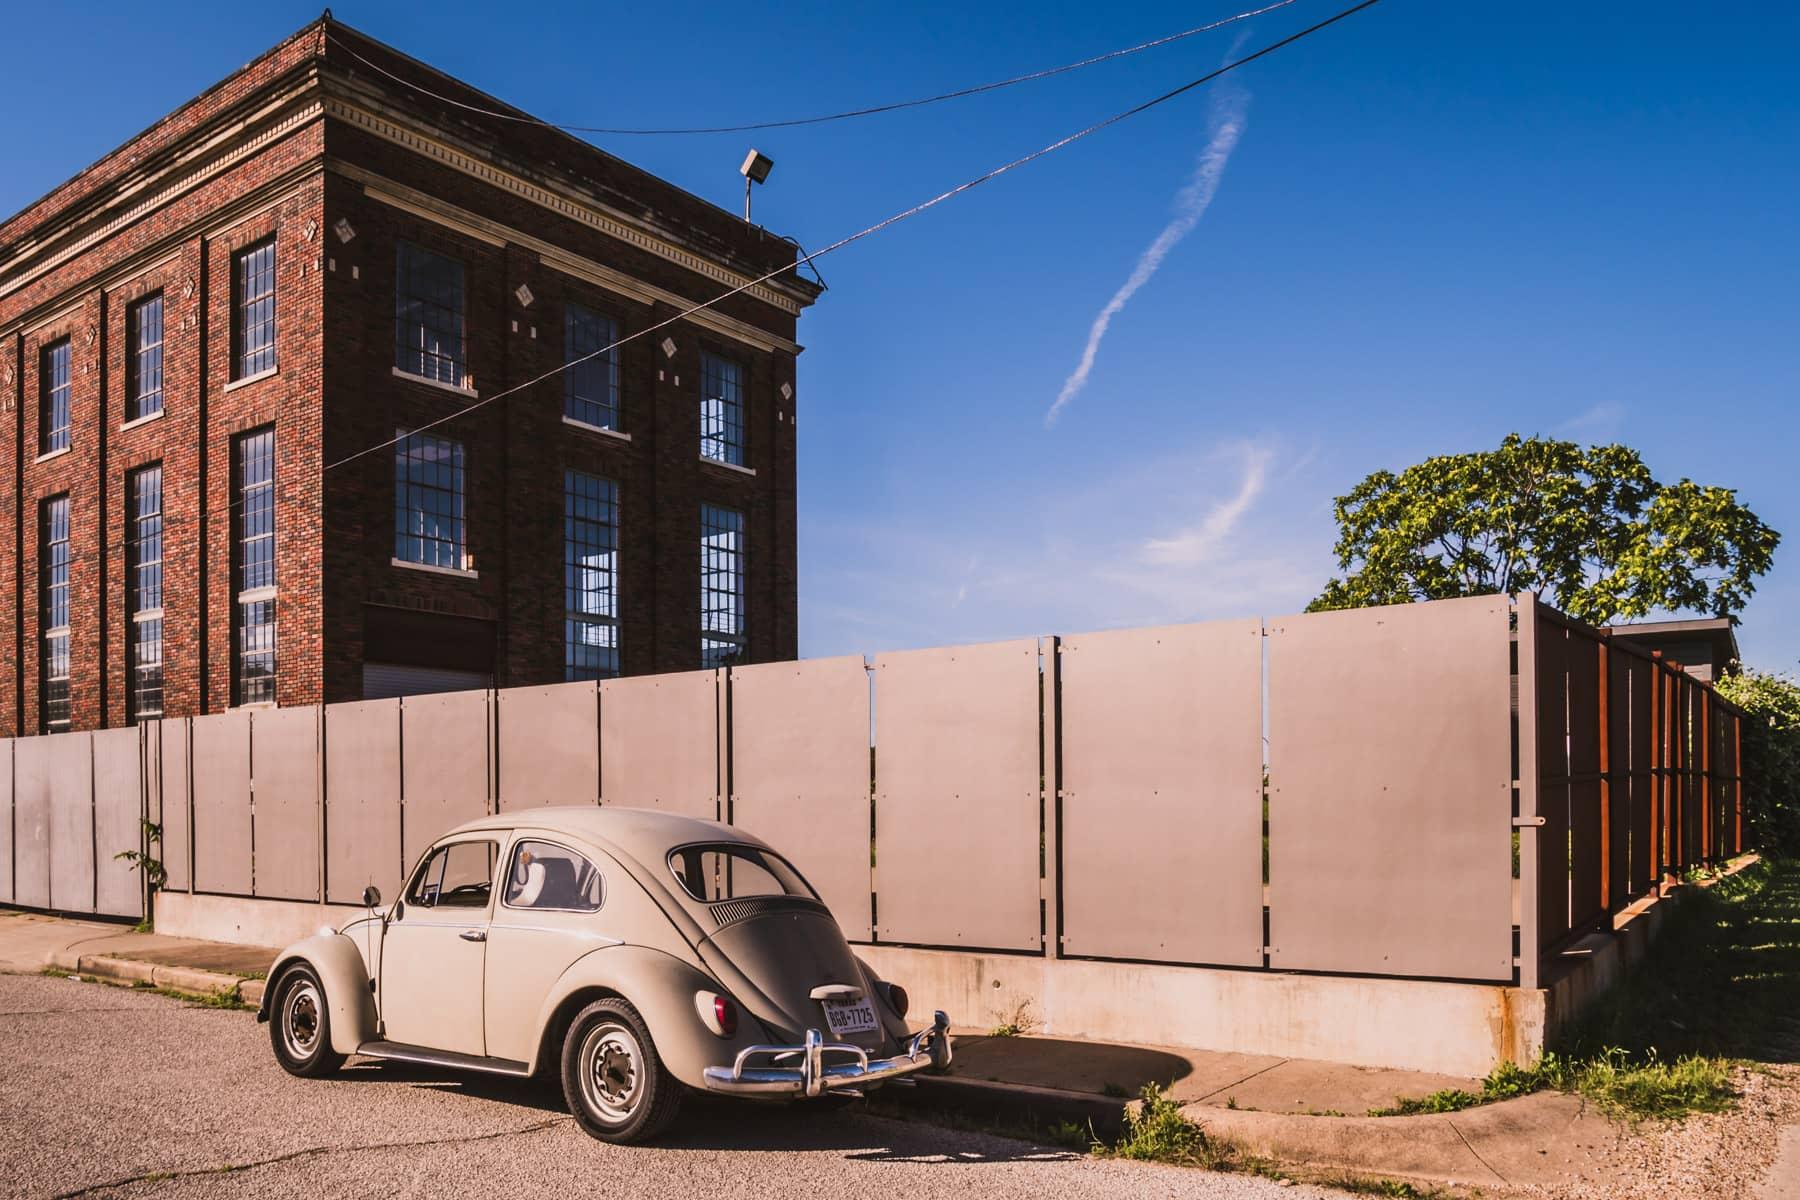 A classic Volkswagen Beetle, parked on a street in Dallas' Cedars Neighborhood near a historic Dallas Power & Light substation.